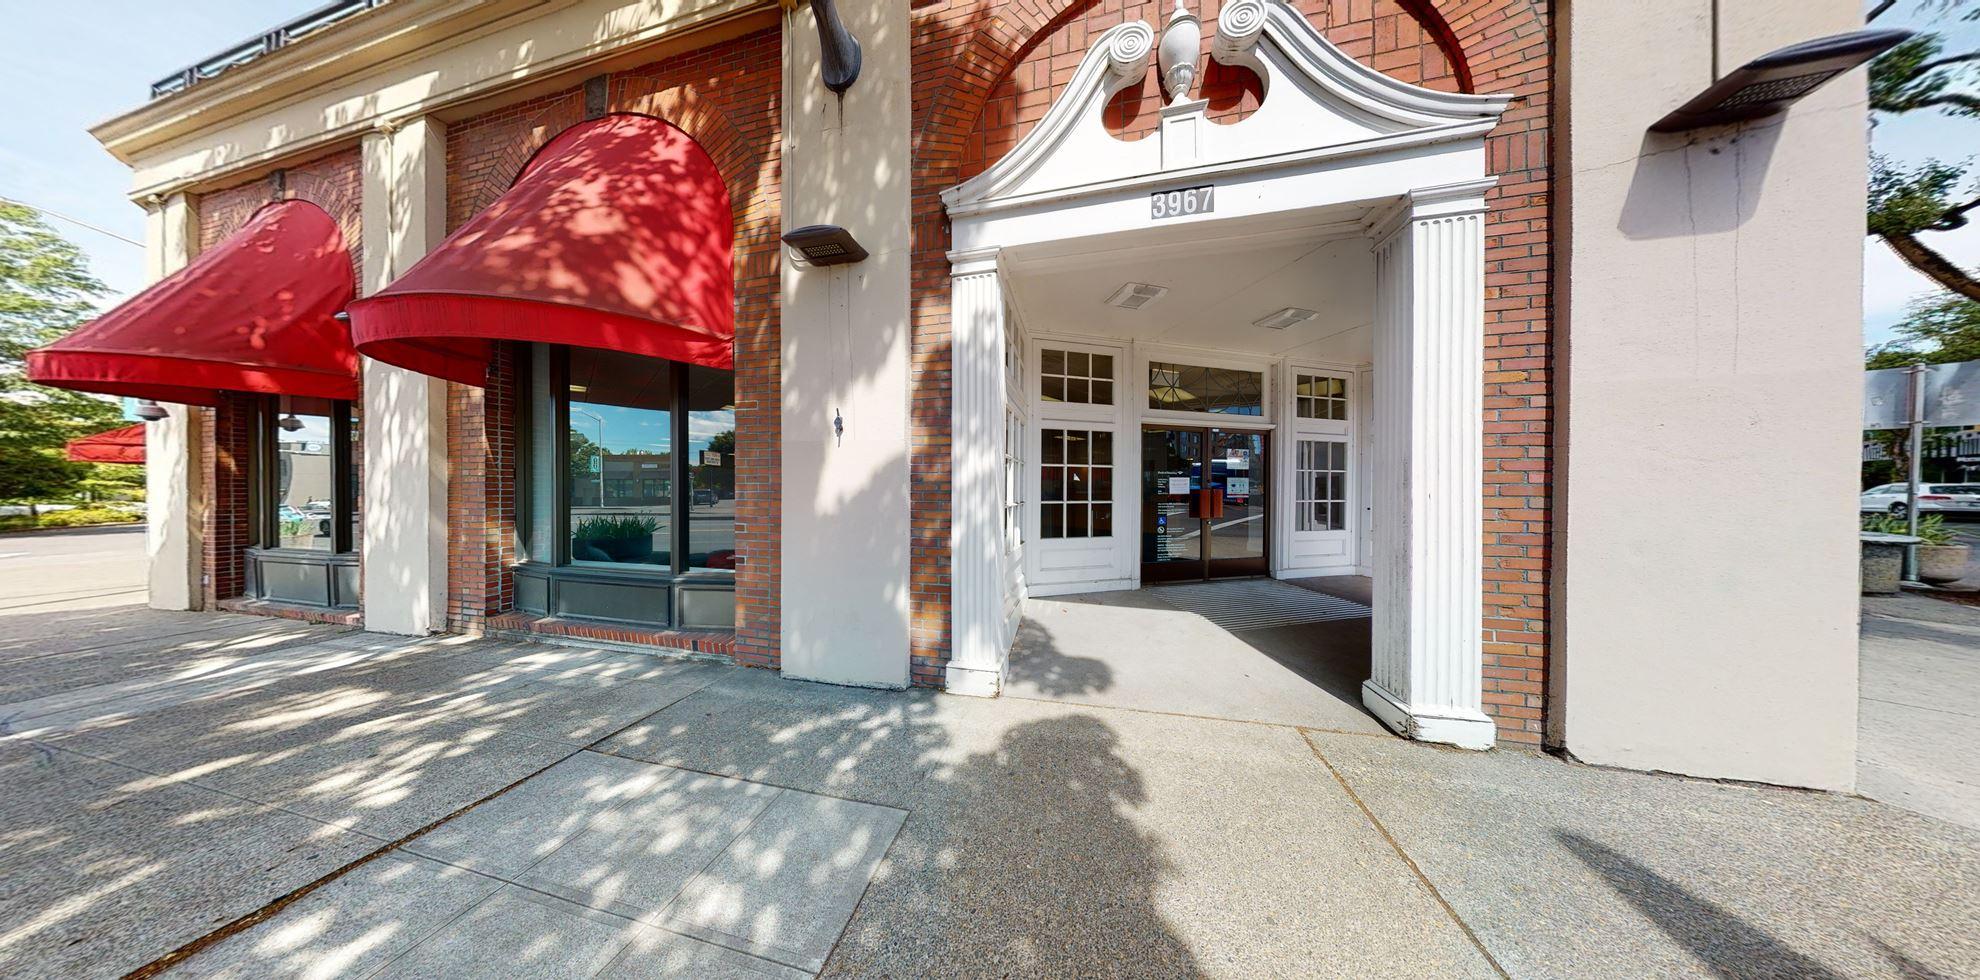 Bank of America financial center with drive-thru ATM | 3967 NE Sandy Blvd, Portland, OR 97232